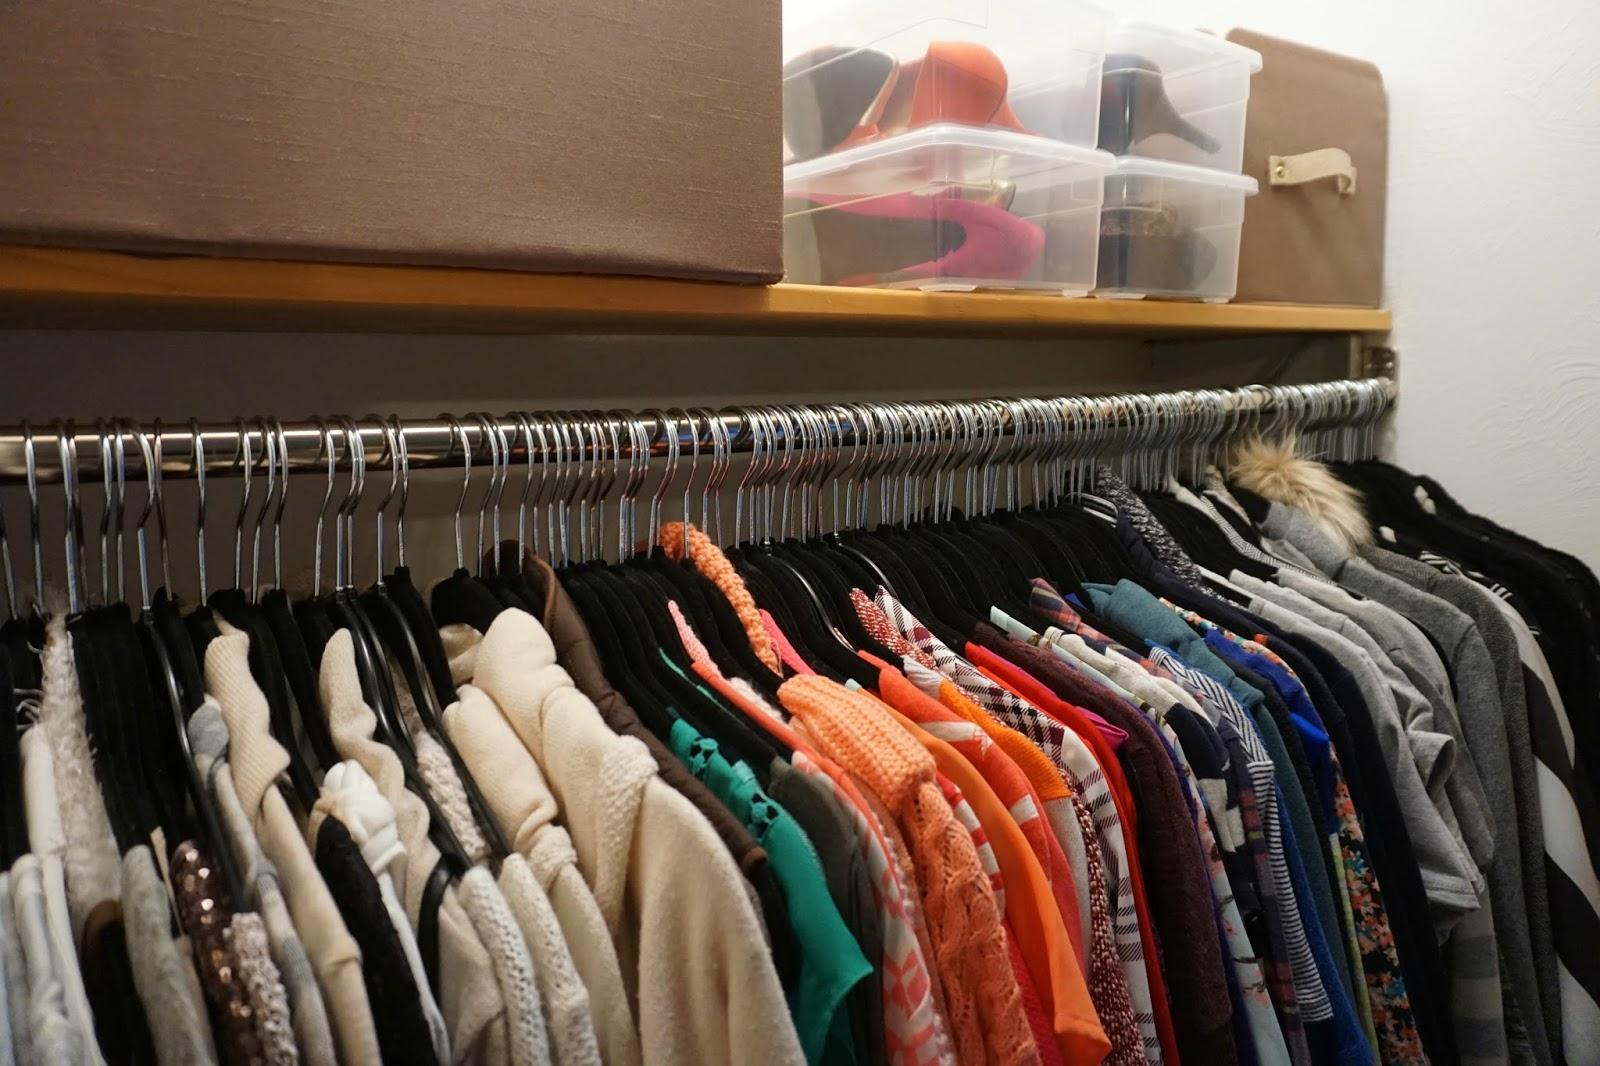 The Power Of An Organized Closet